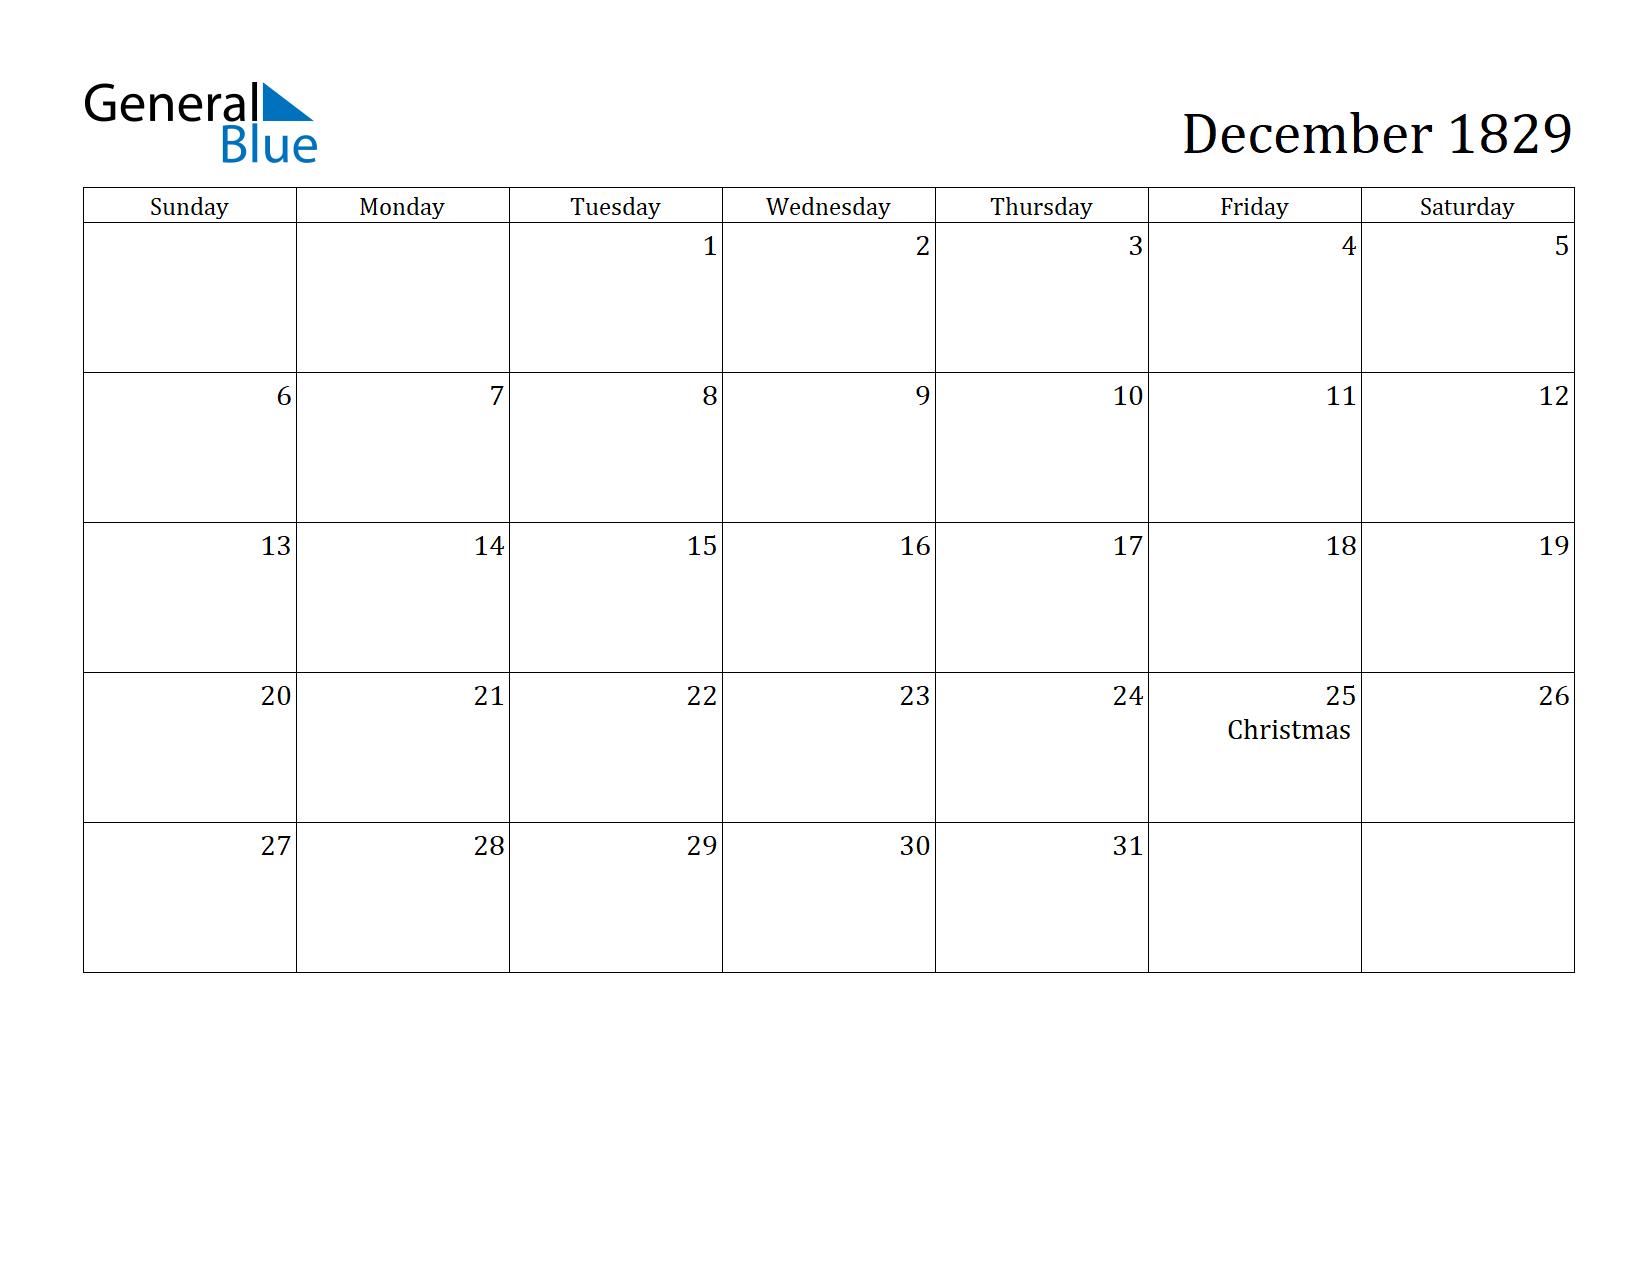 Image of December 1829 Calendar